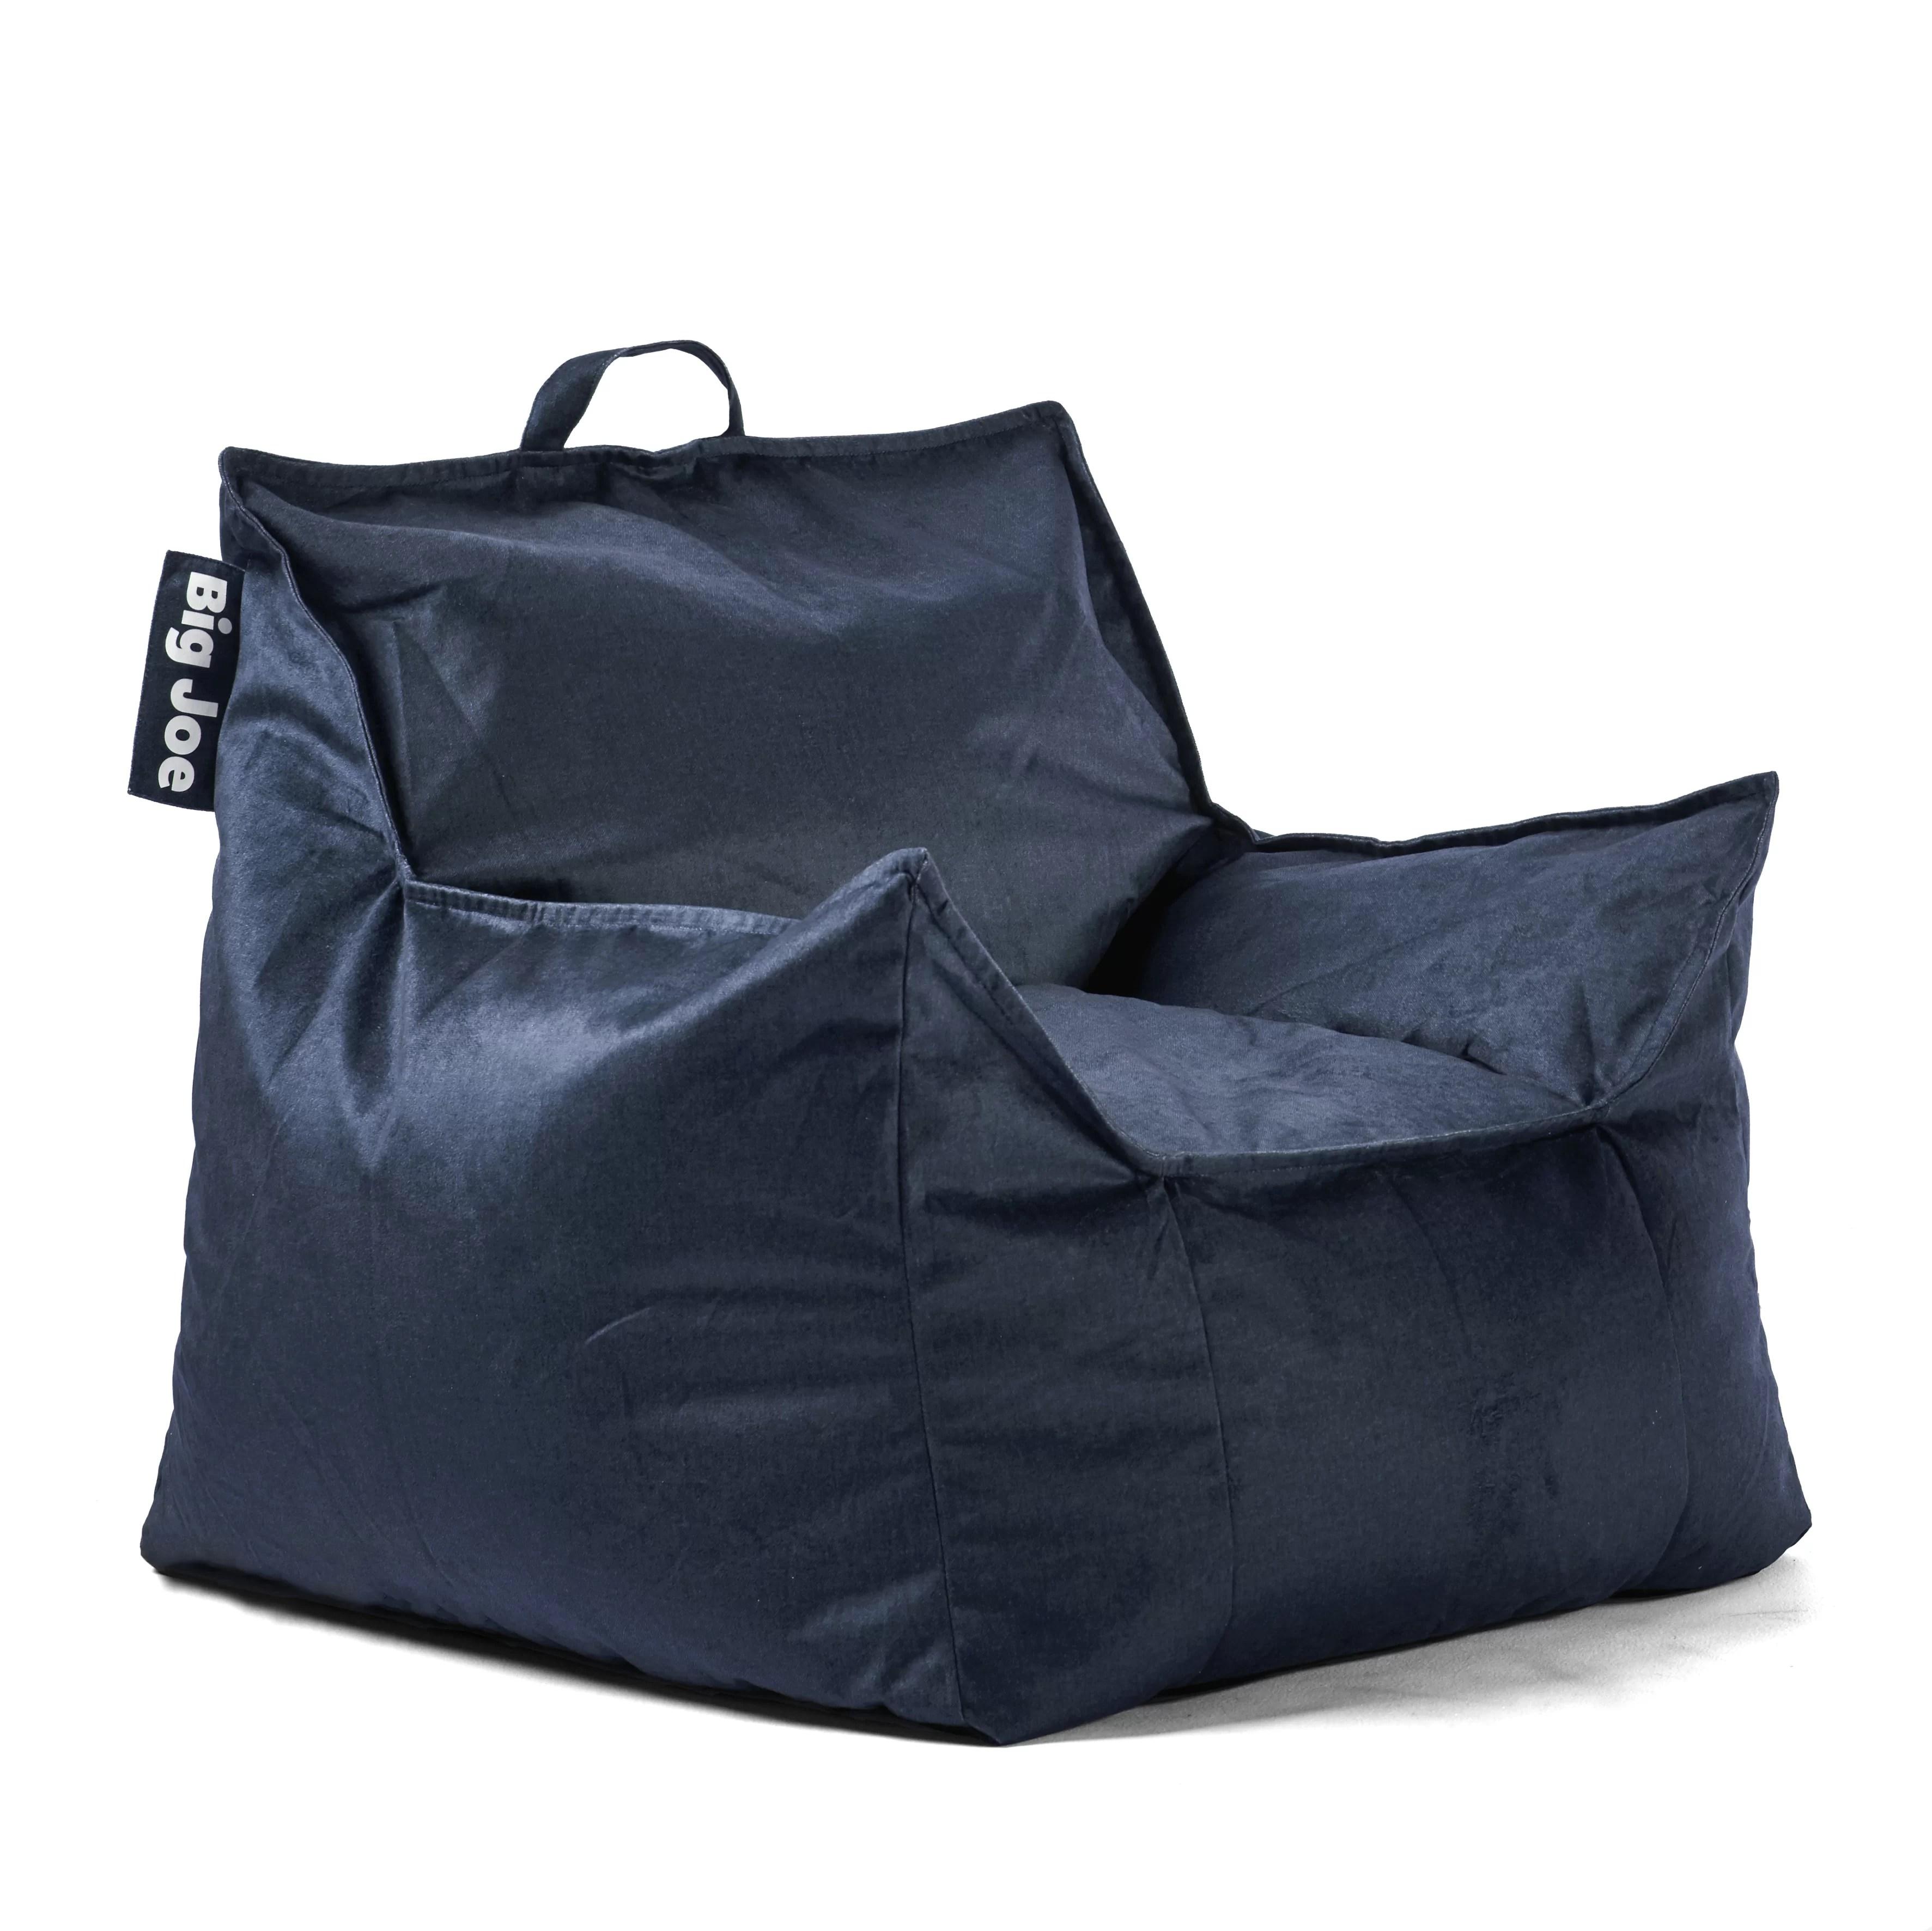 bean bags chair folding camping table and chairs comfort research big joe mitten bag reviews wayfair